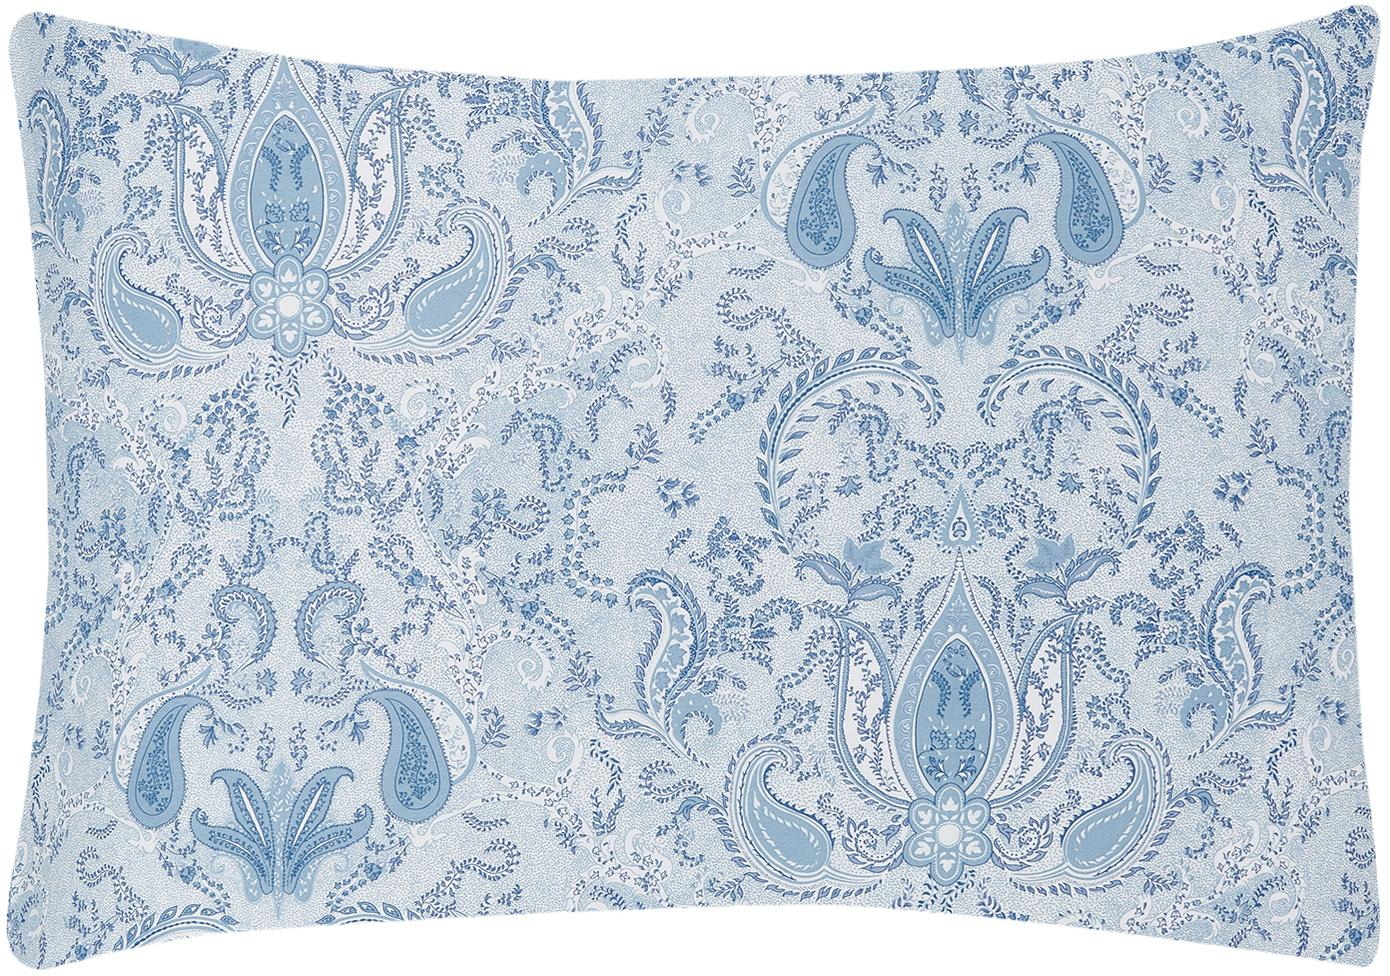 Funda de almohada de satén Grantham, Azul, An 50 x L 70 cm